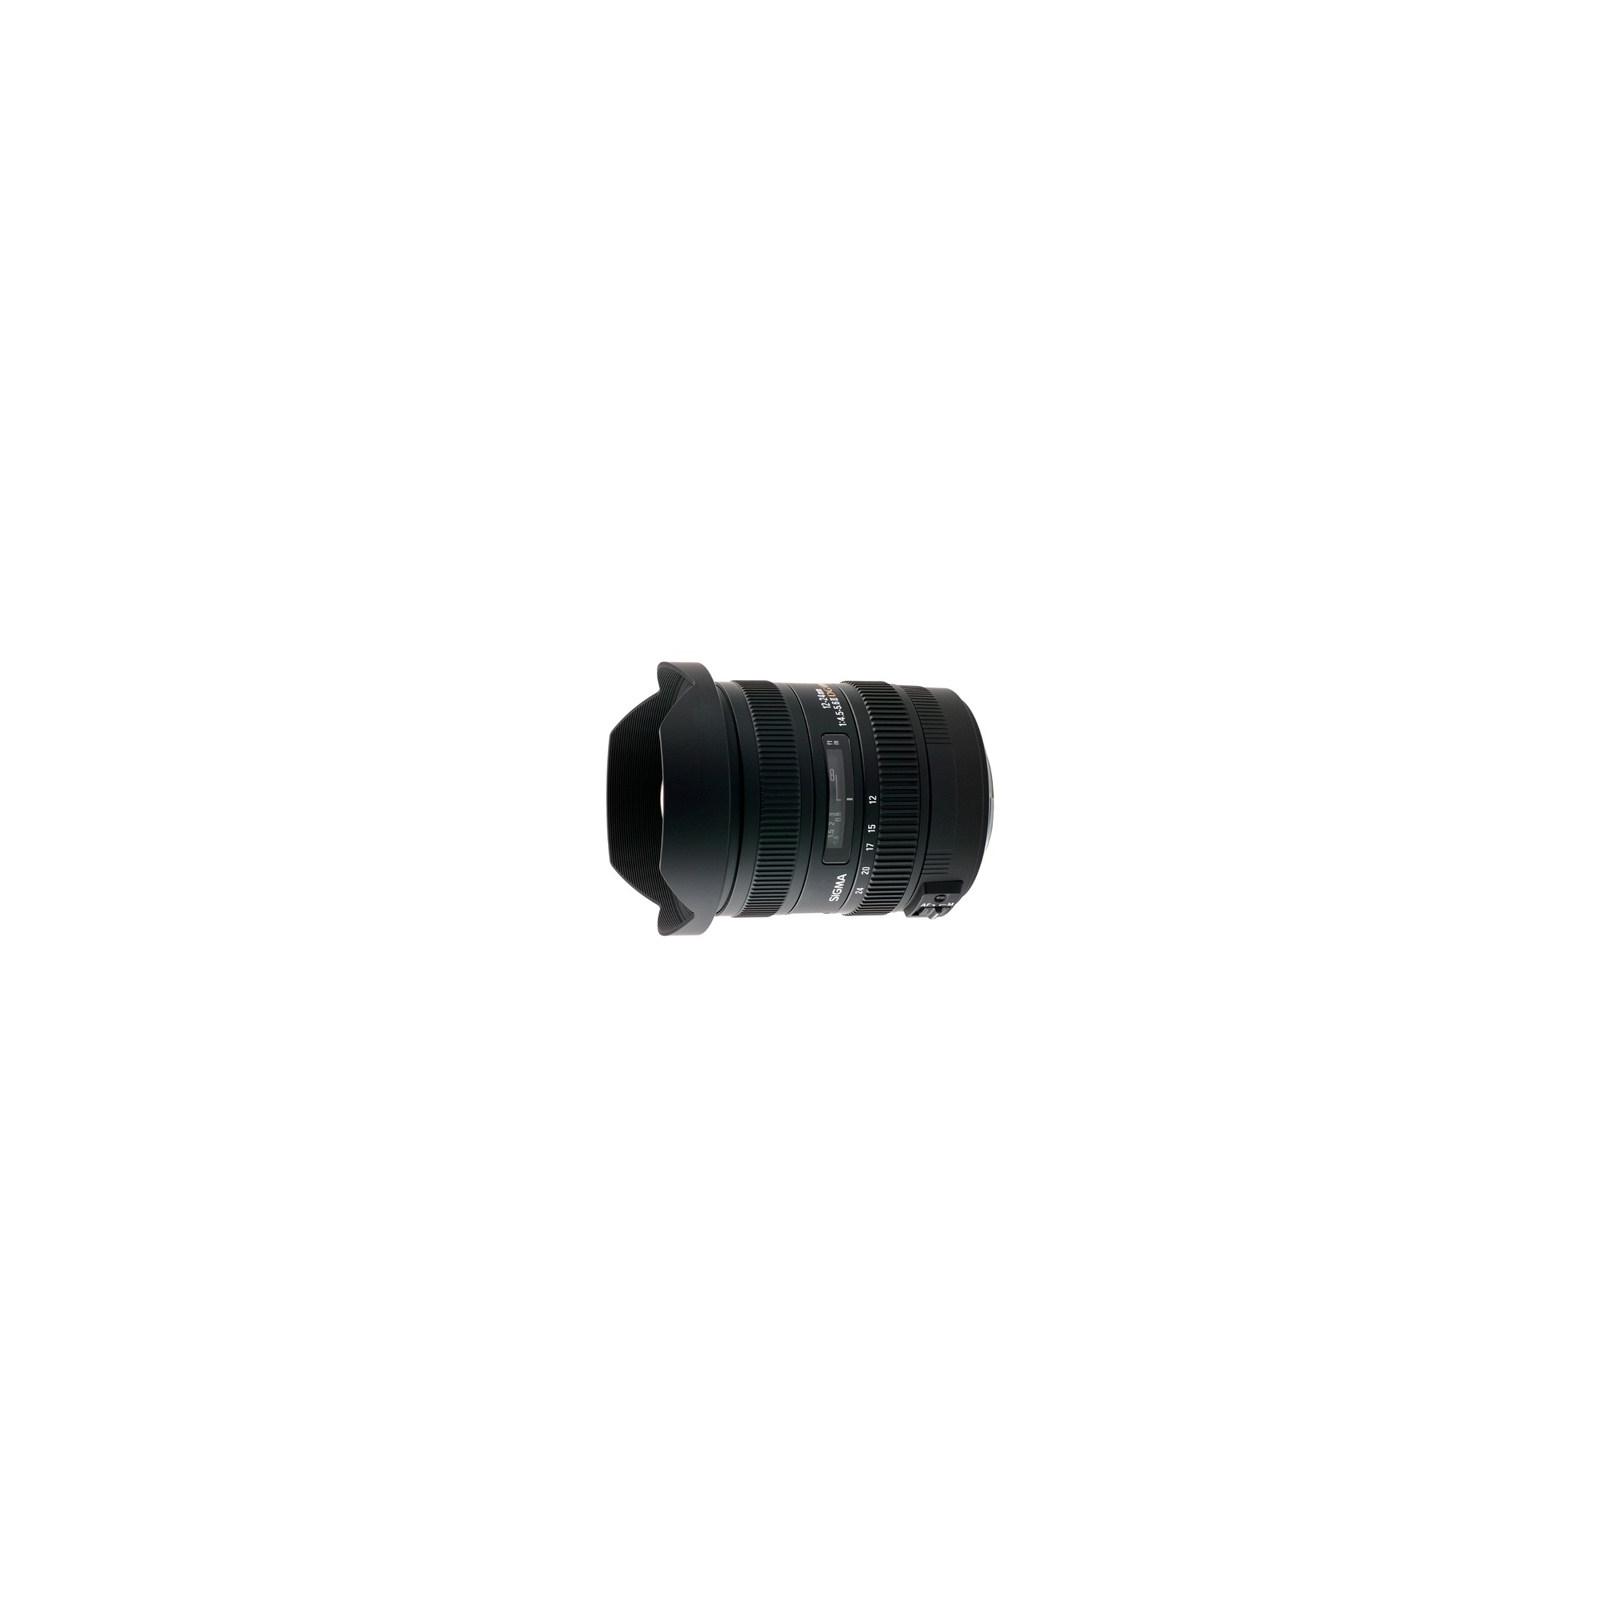 Объектив Sigma 12-24mm f/4.5-5.6 II DG HSM for Nikon (204955)